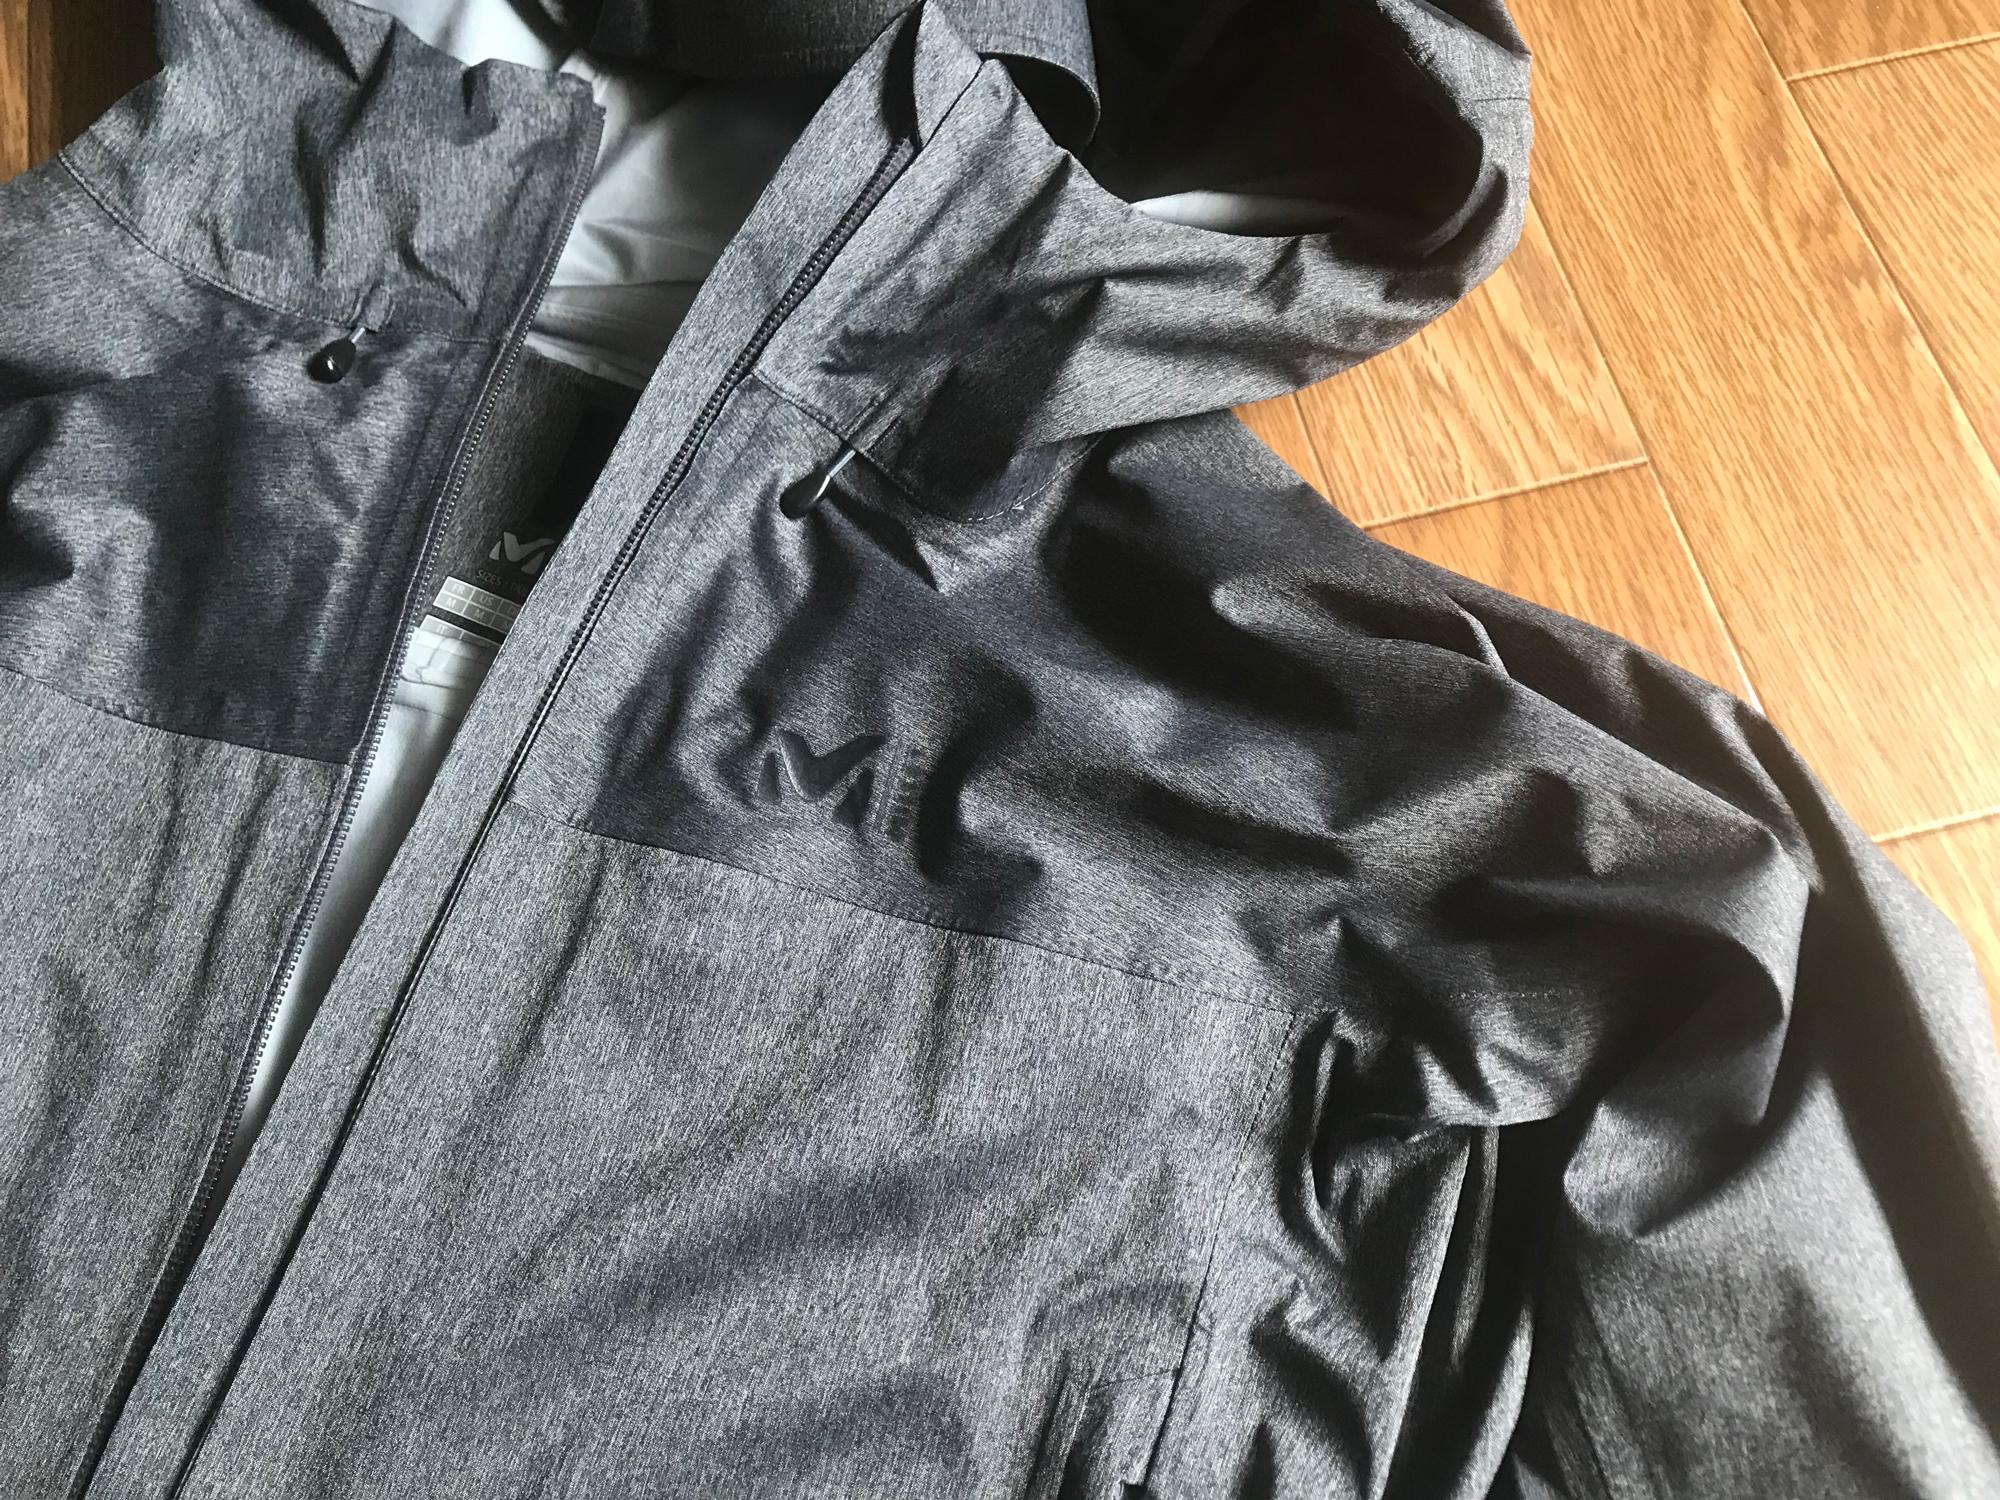 Millet(ミレー)の夏用レインウエア「ティフォン50000」ストレッチジャケットが快適!なのでちょっとレビュー